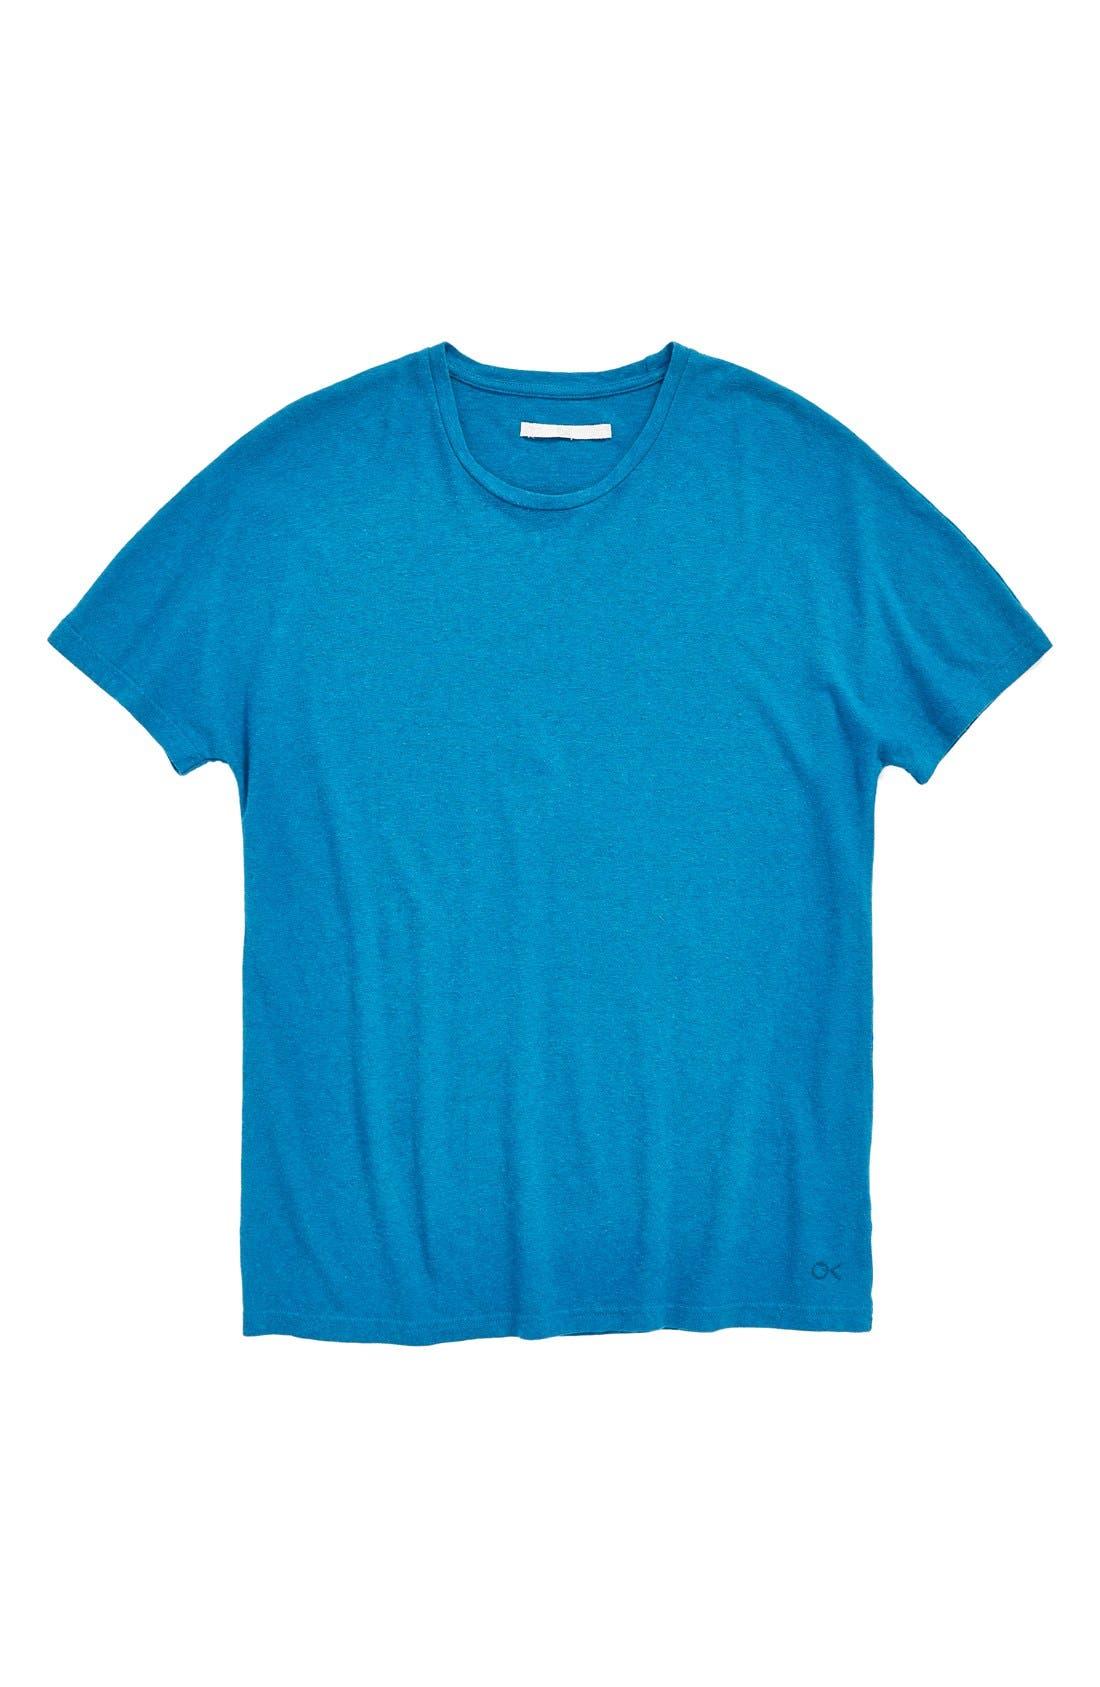 'Outerknown' Crewneck T-Shirt,                             Main thumbnail 1, color,                             420